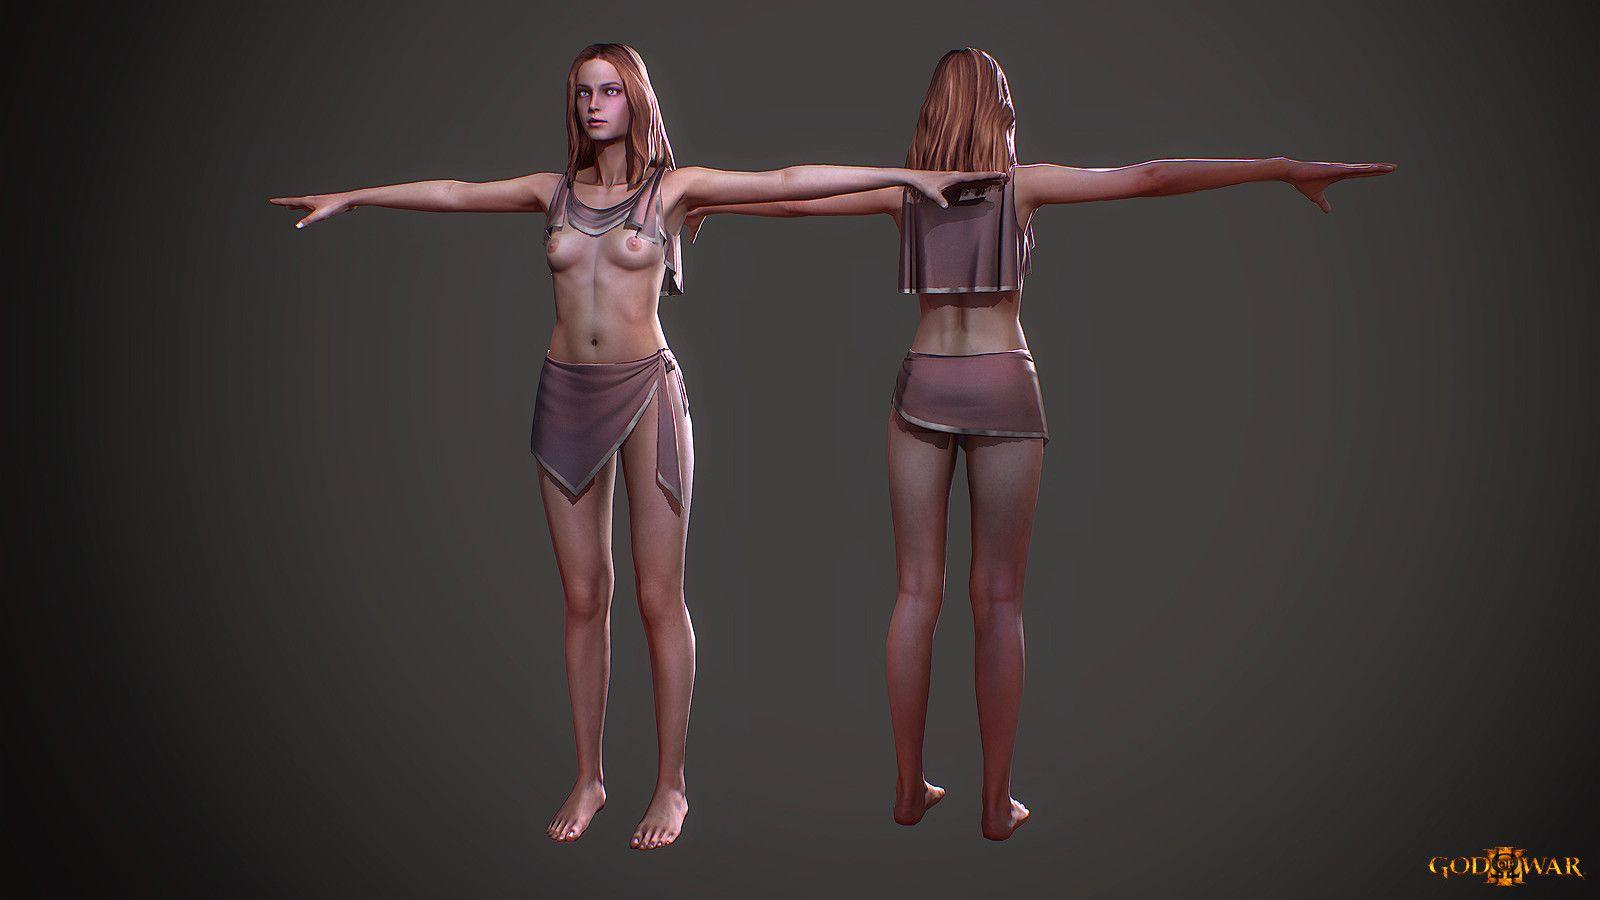 god-of-war-nude-women